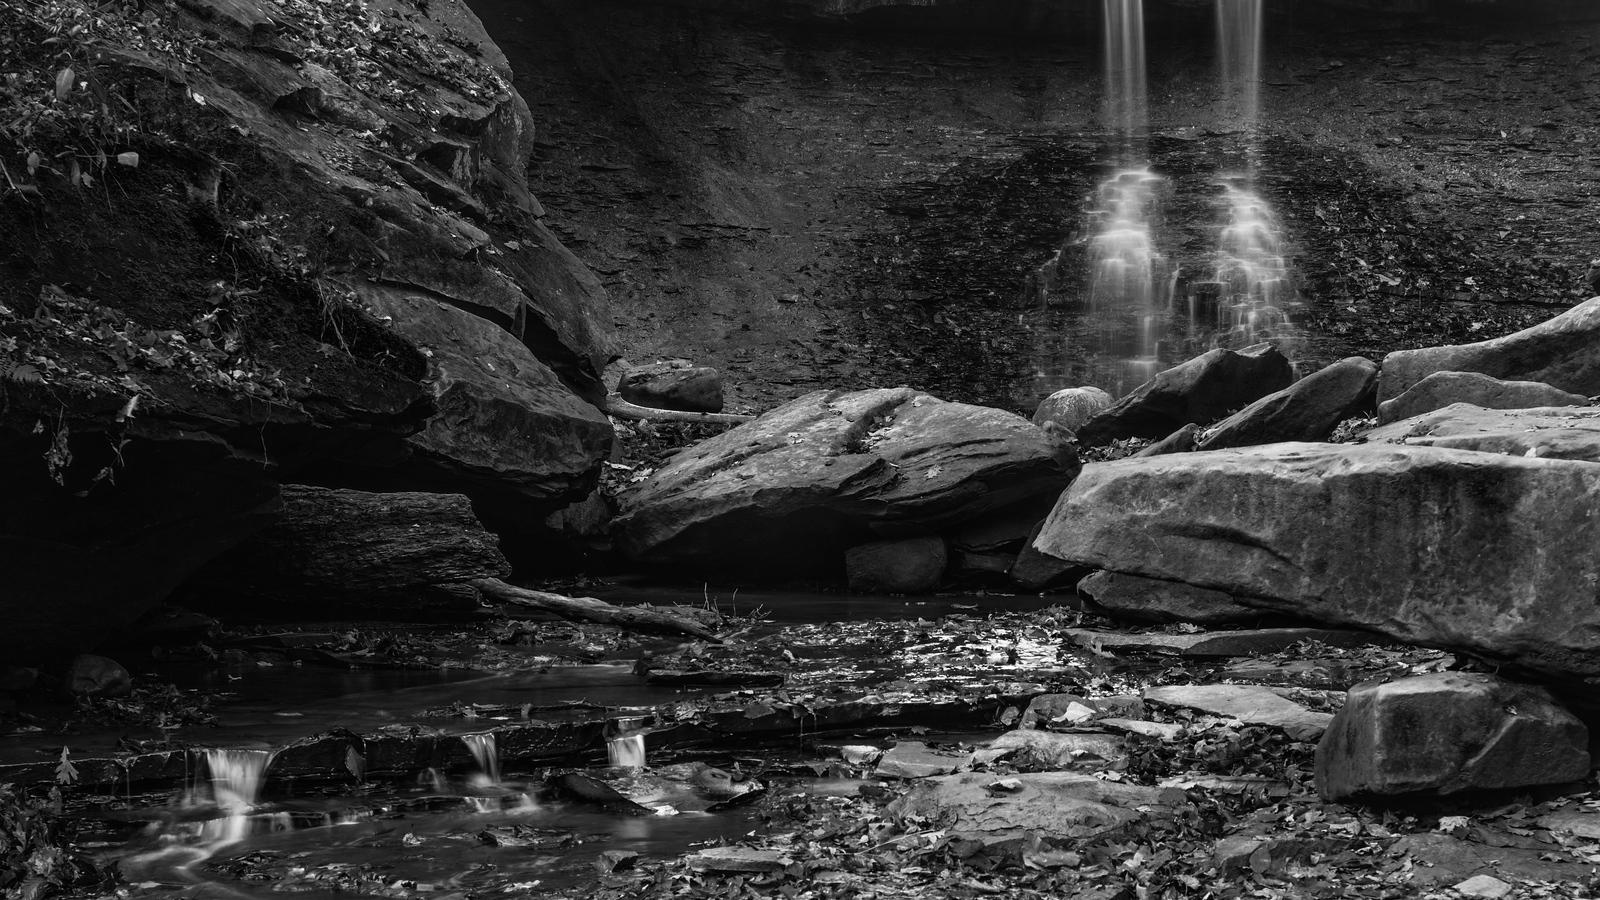 Blue Hen Falls, Cuyahoga Valley National Park, October 2015 - Study 02.